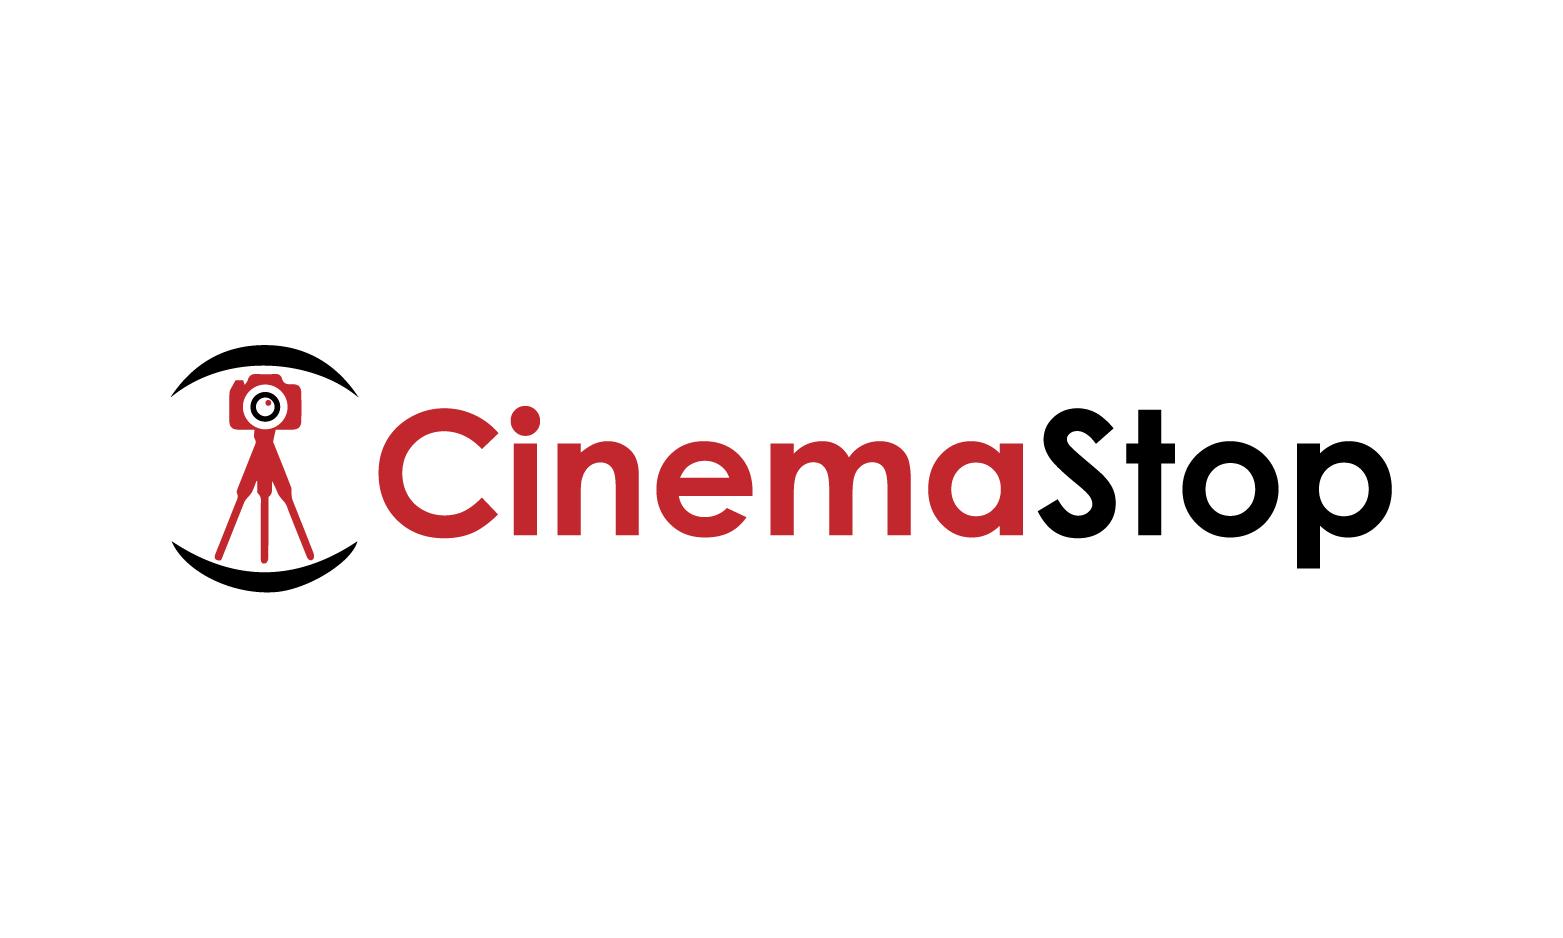 CinemaStop.com